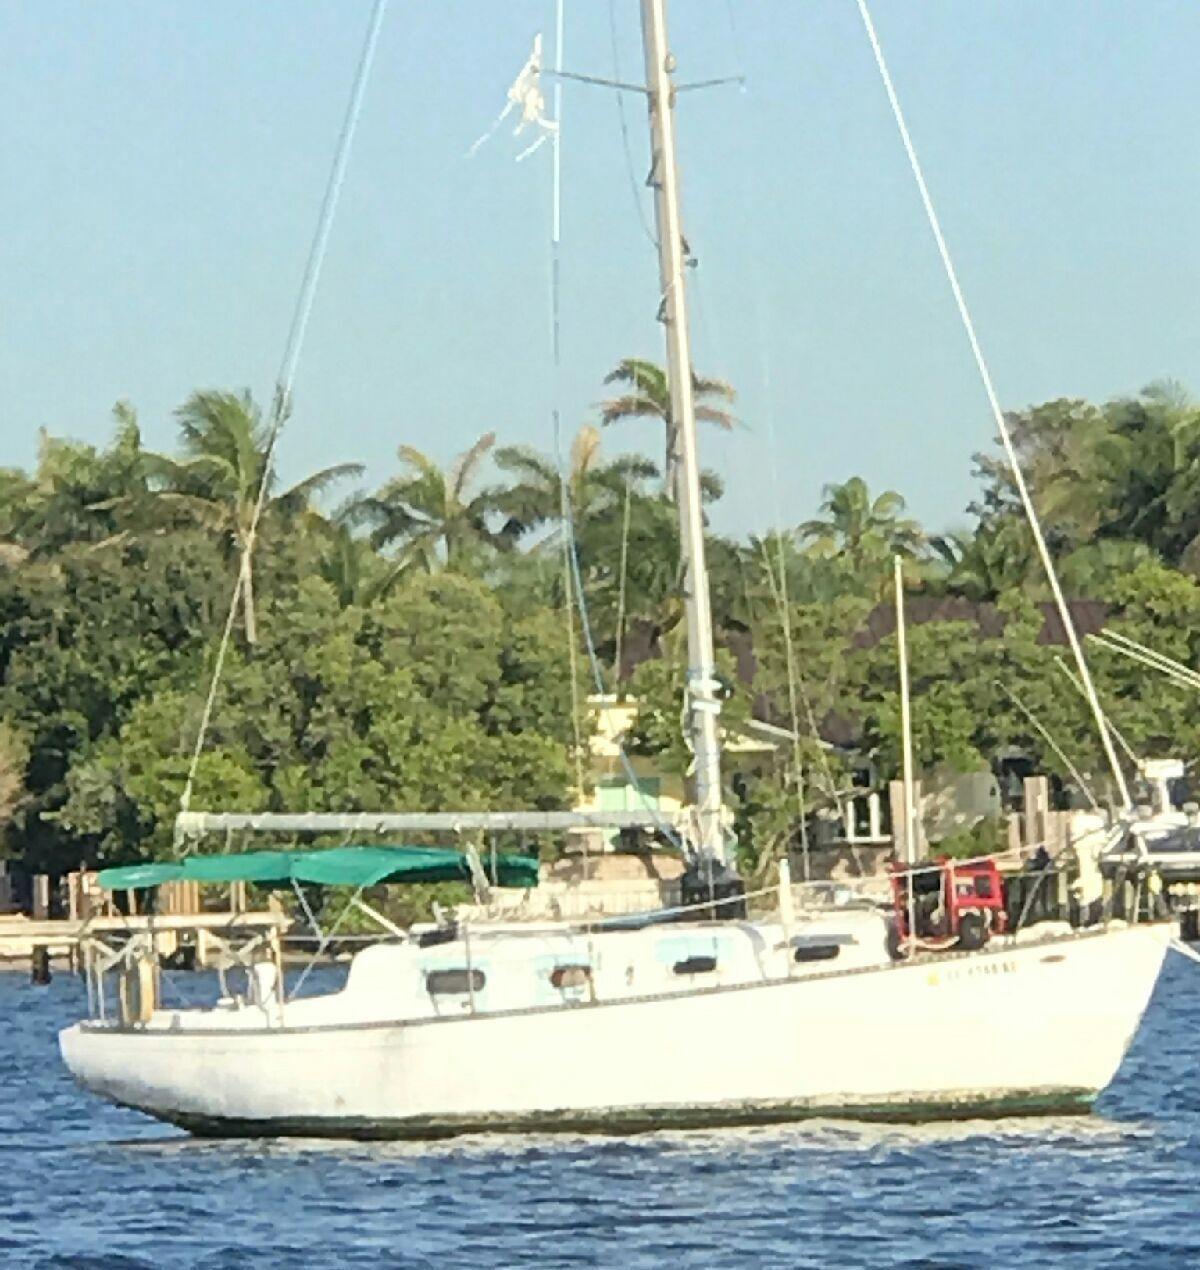 1974 Morgan 30' Sailboat - Florida